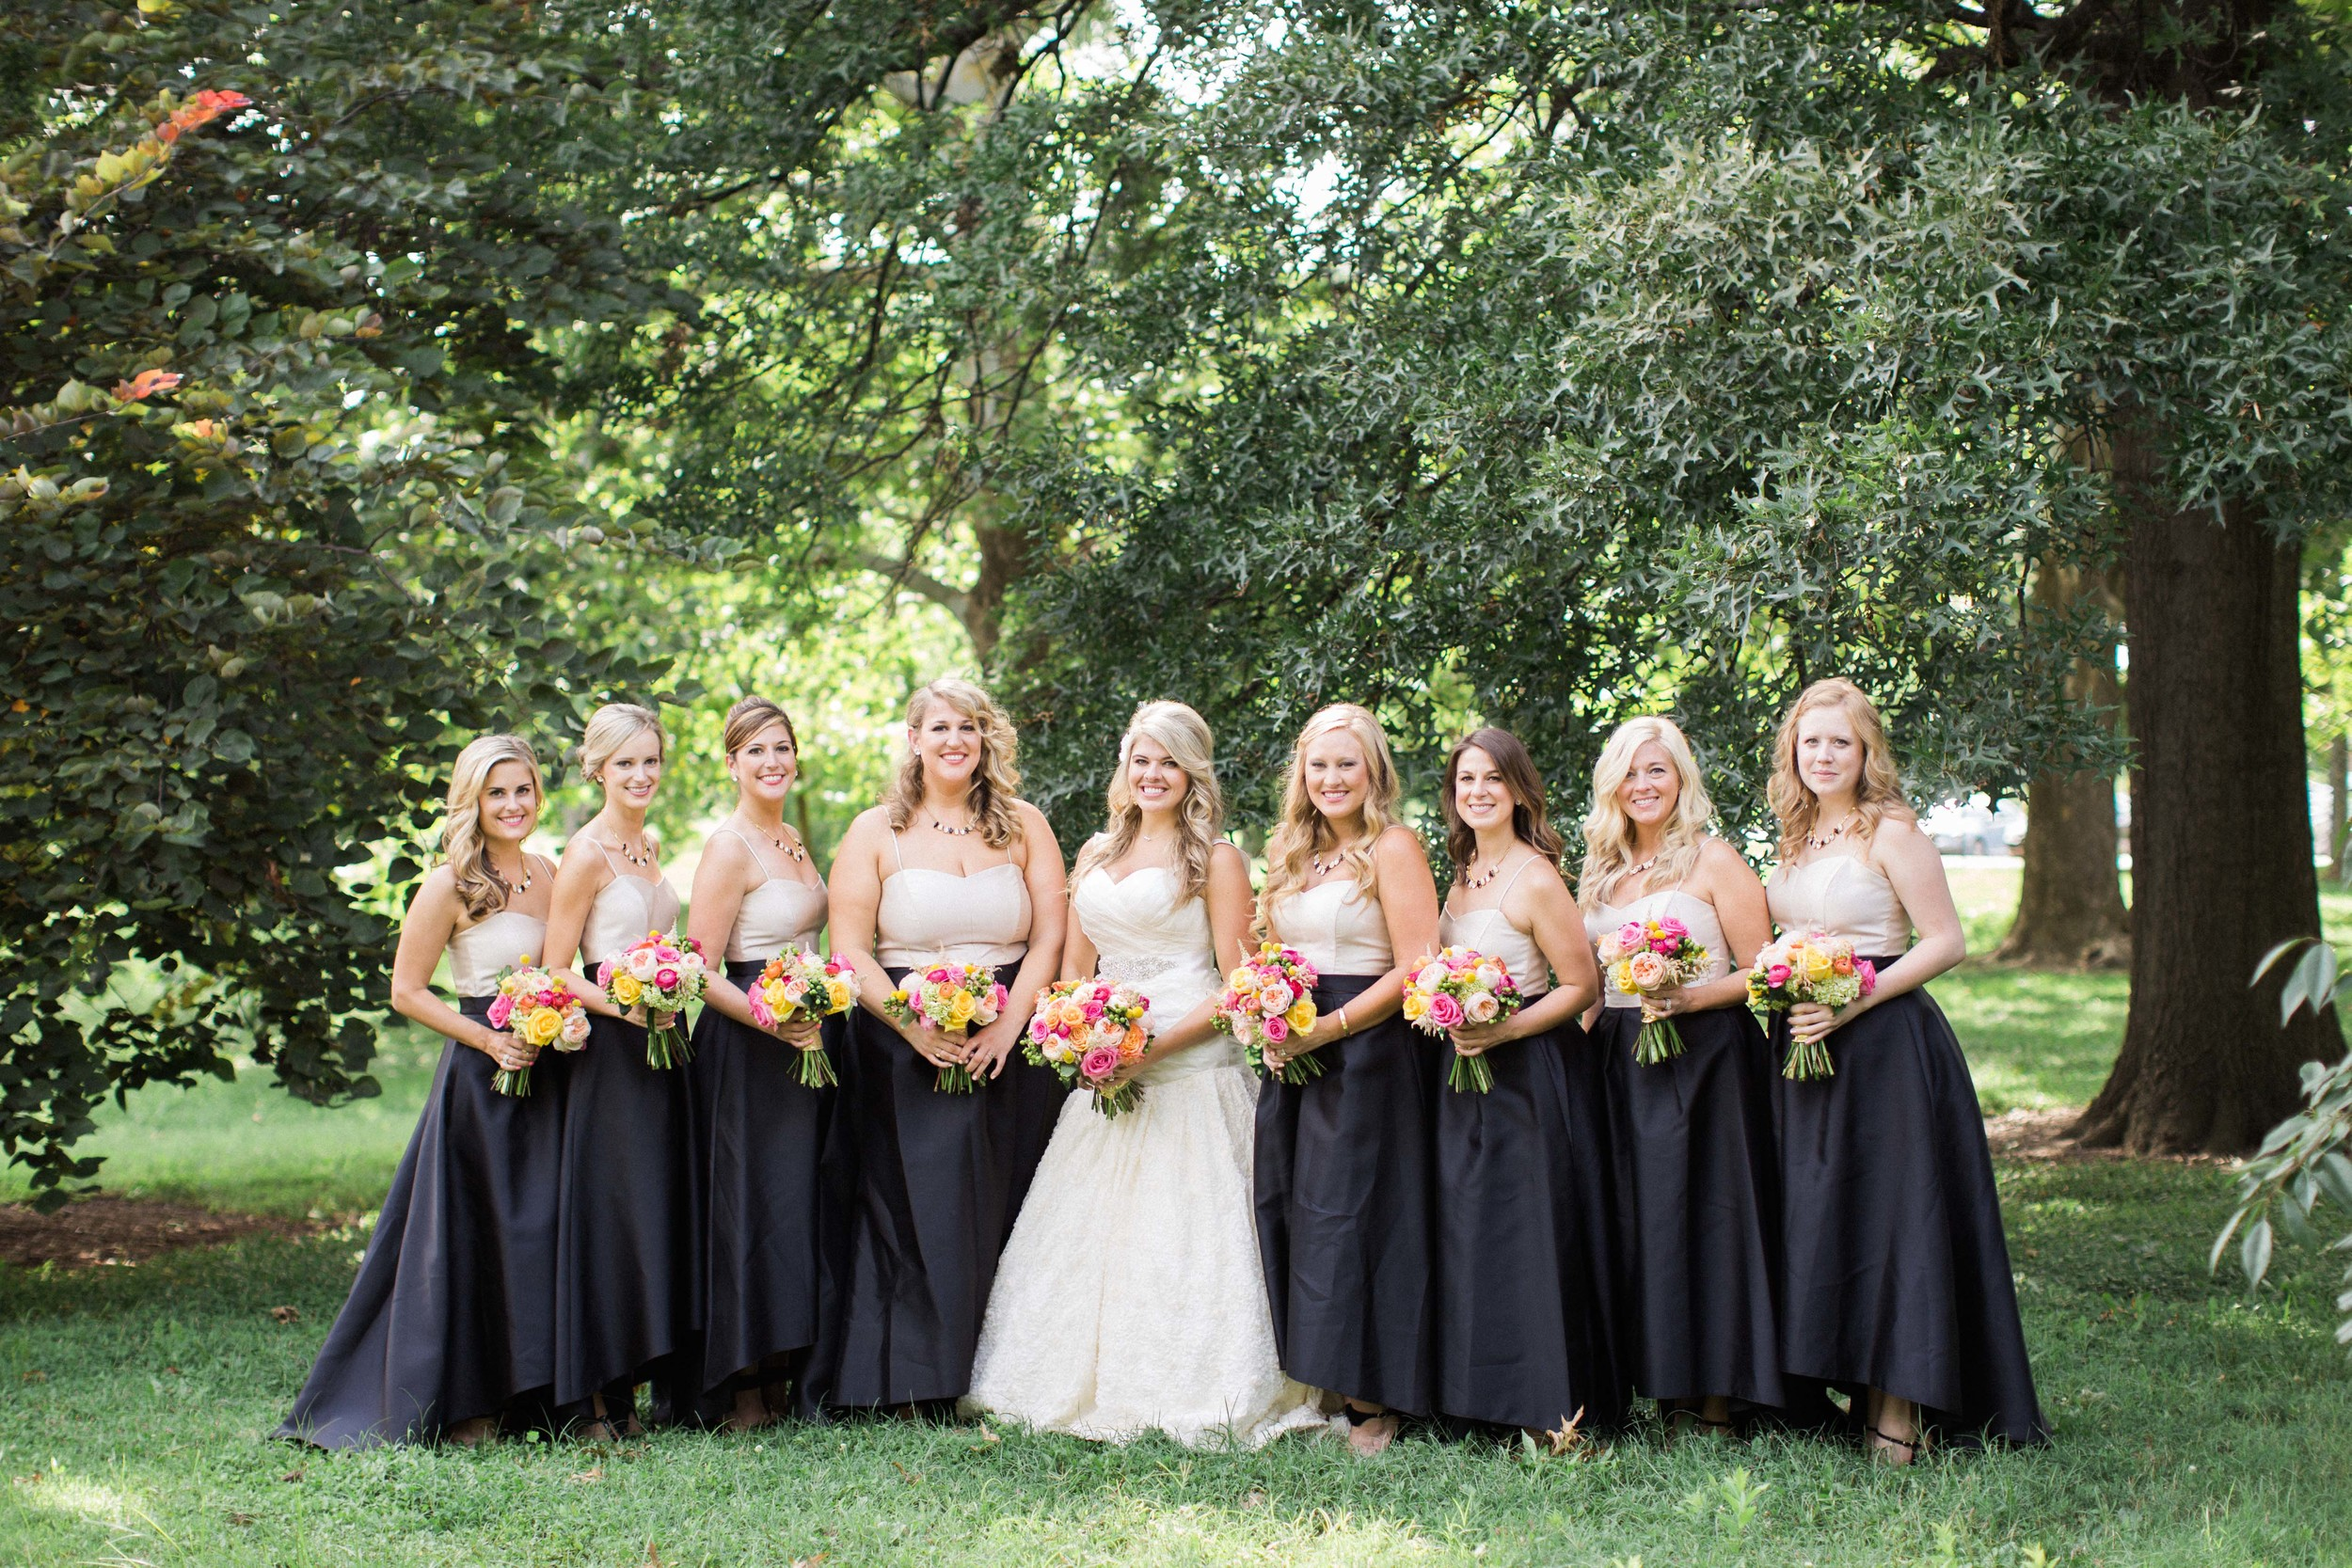 Chase Park Plaza St Louis Wedding Photo-1053.jpg